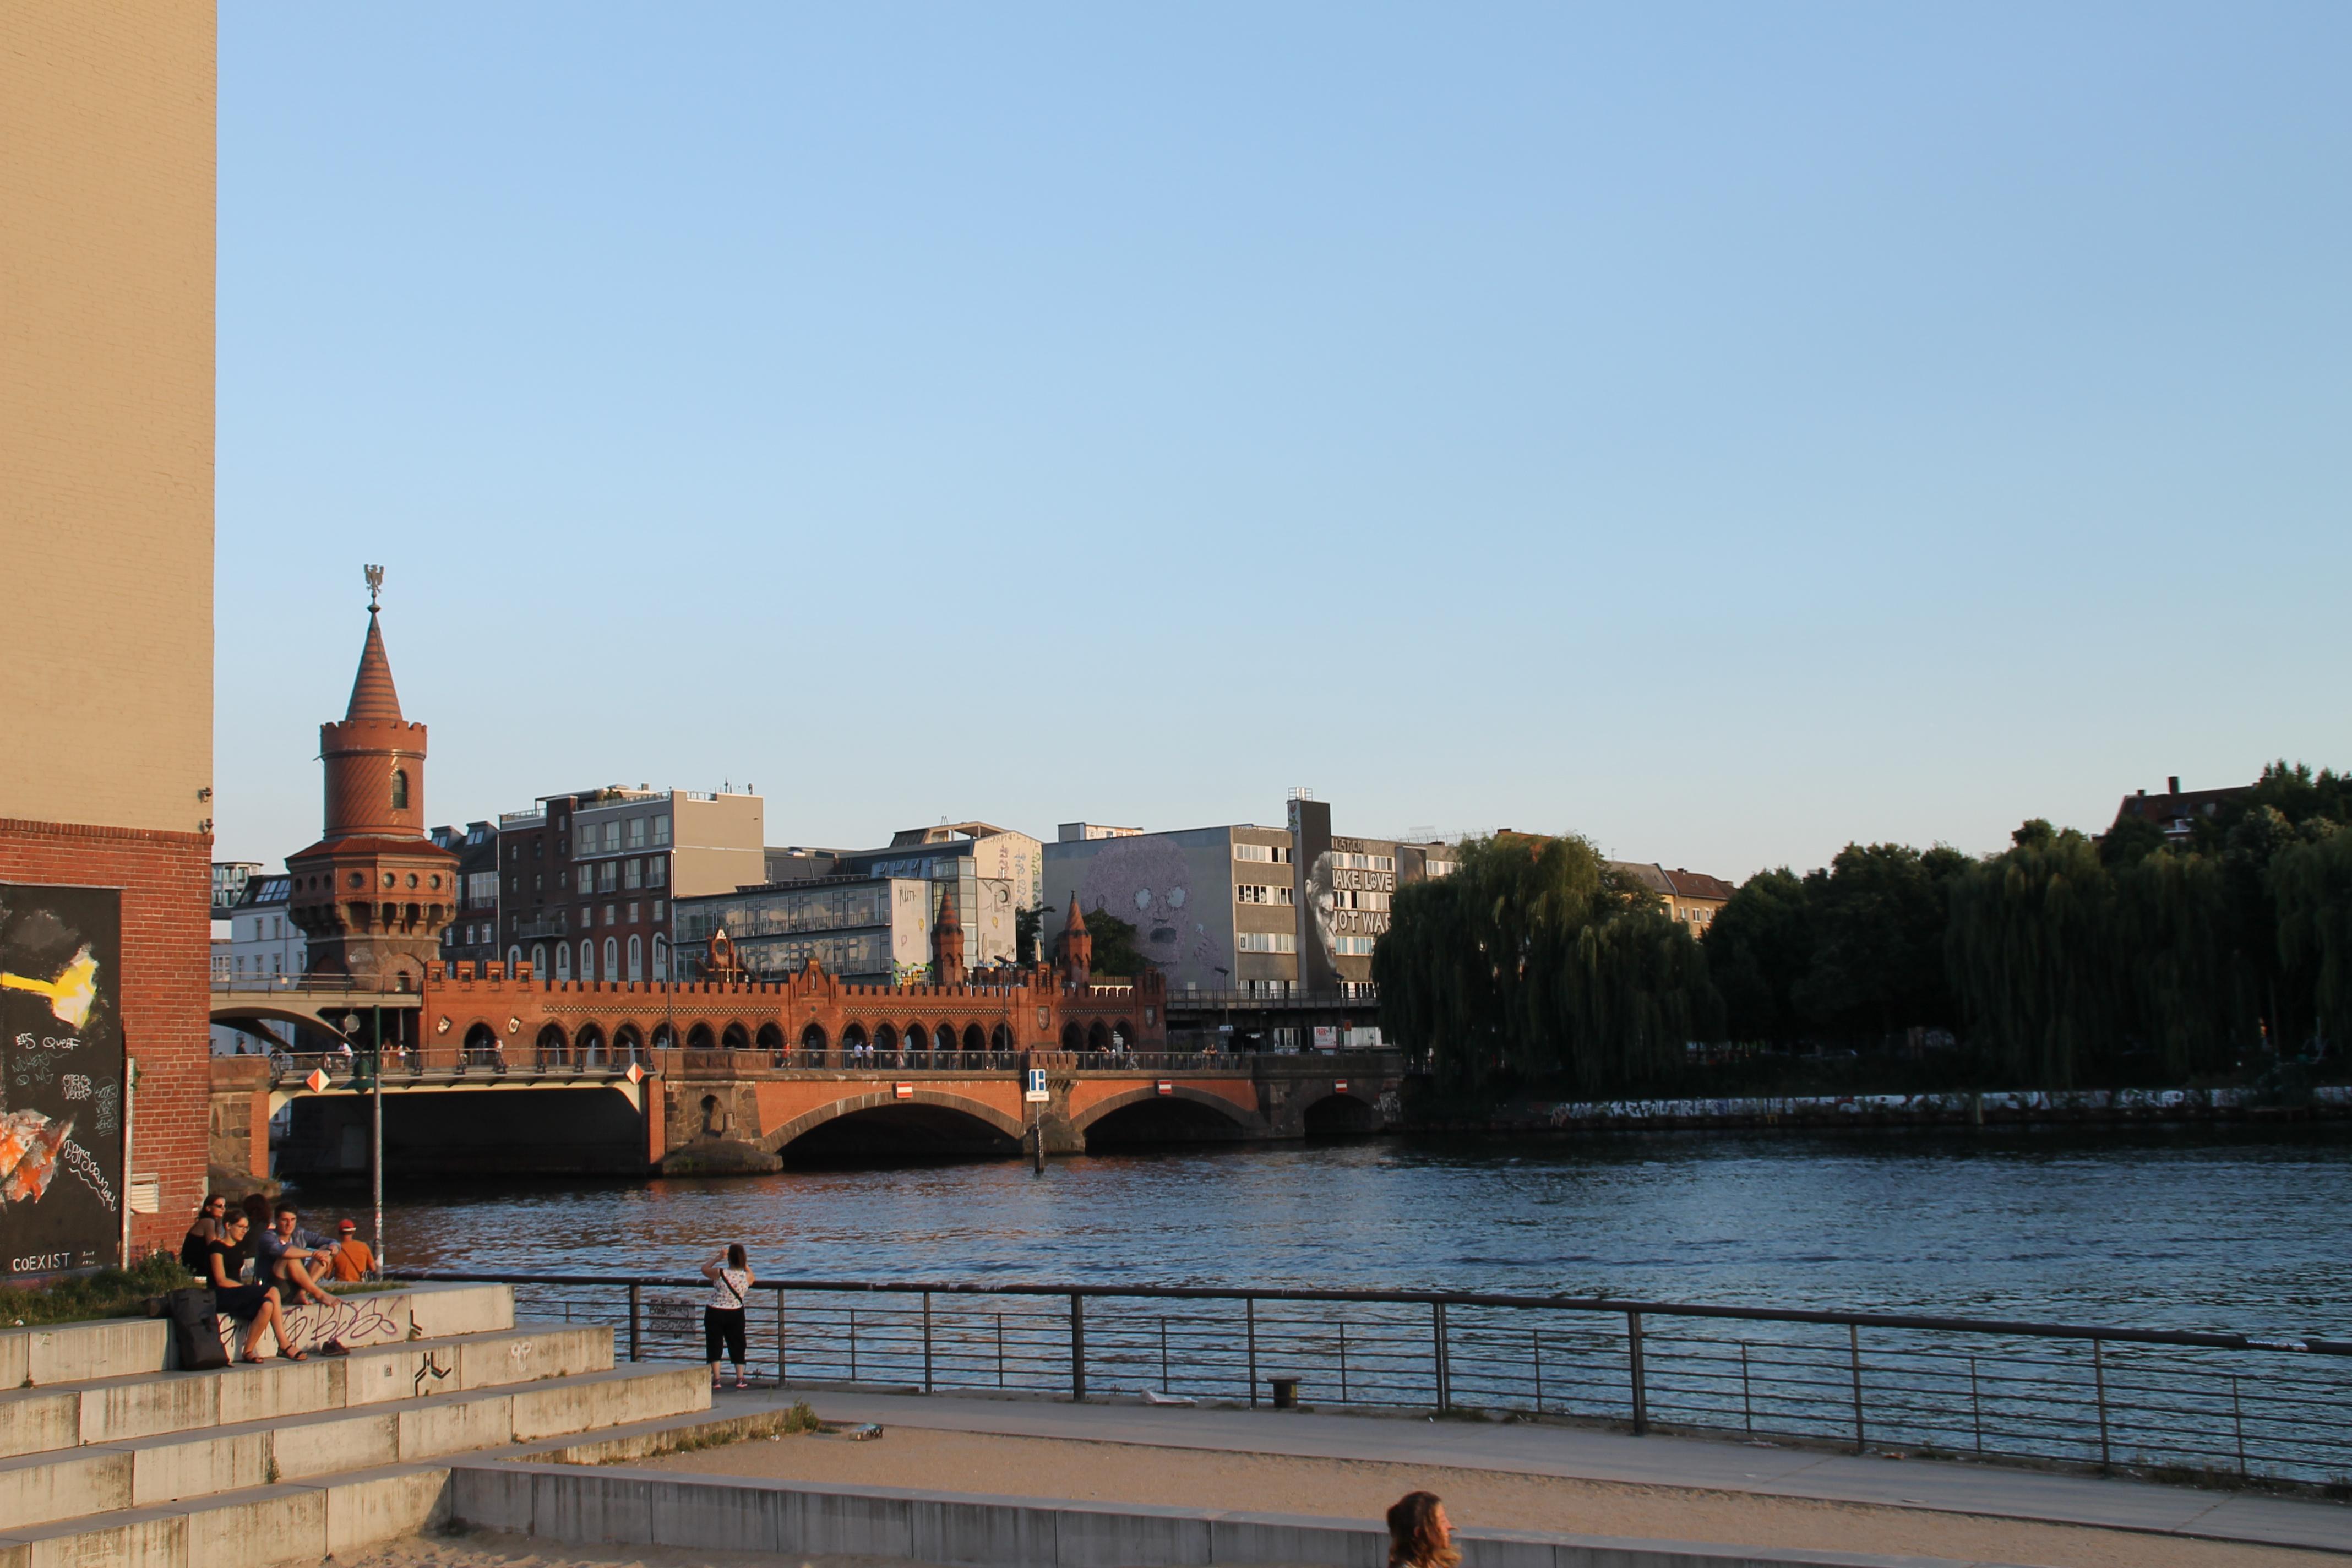 Oberbaumbrücke sobre el riu Spree